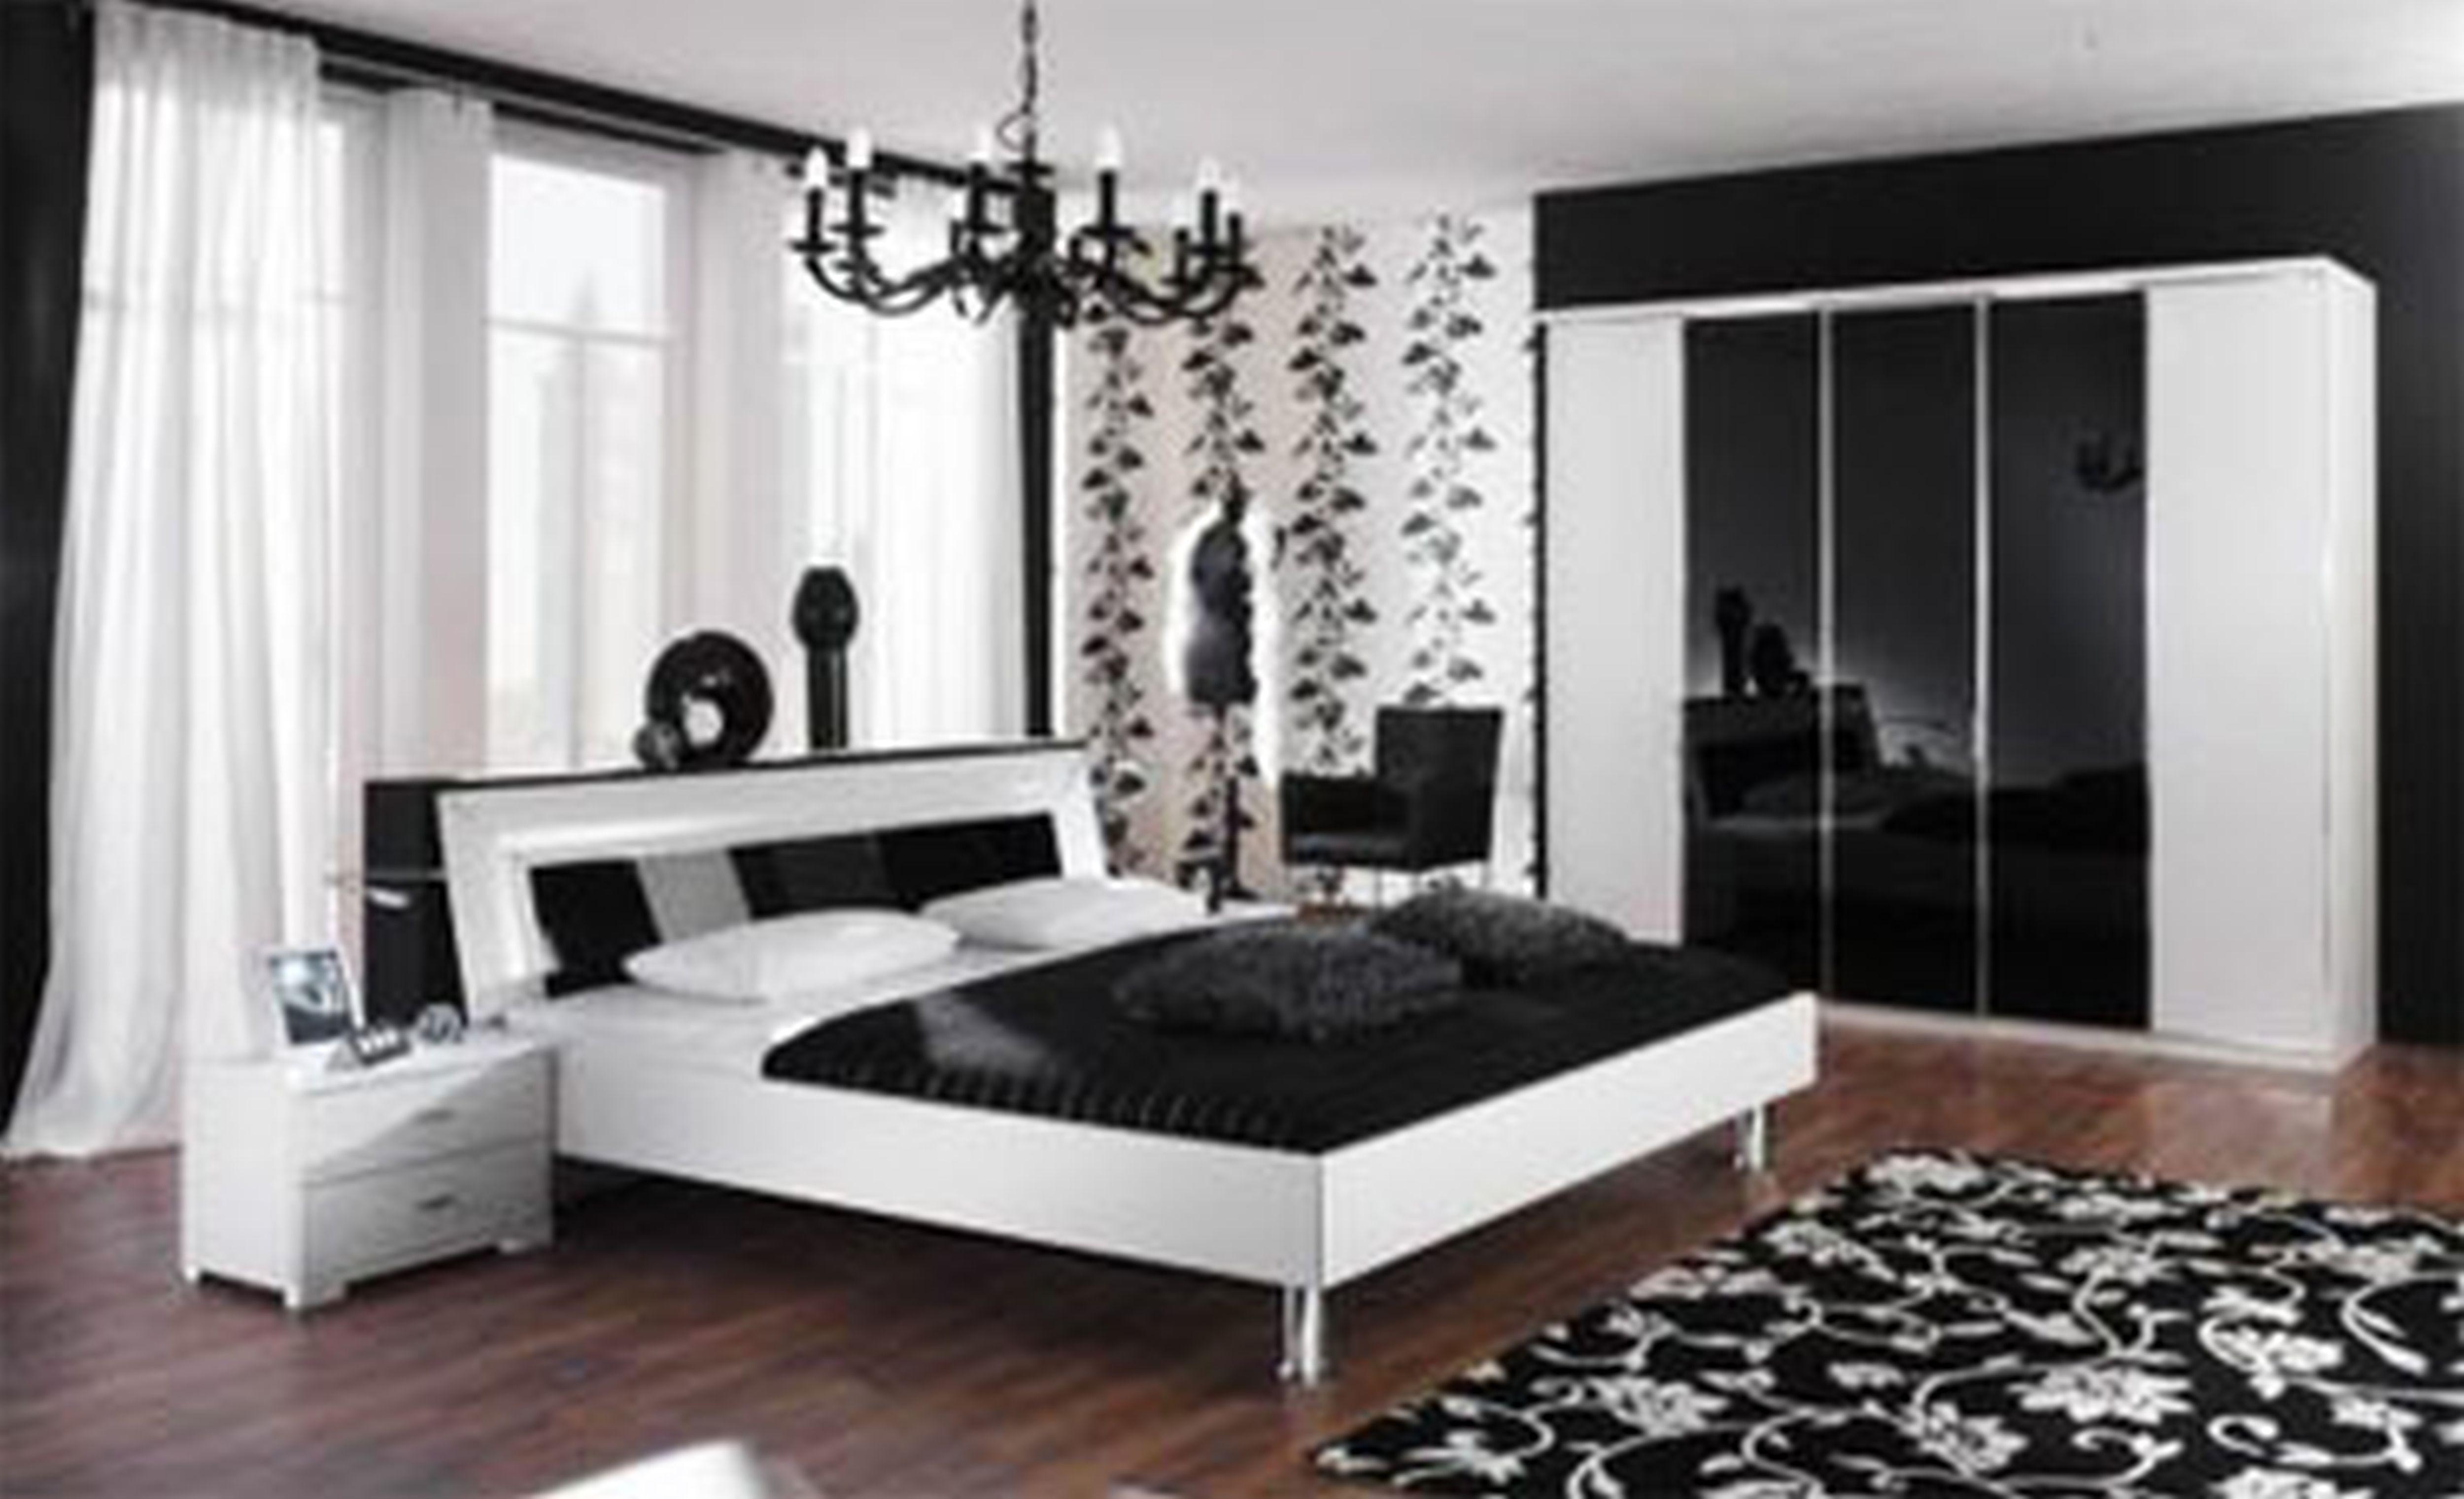 Bedroom Decor Ideas Black And White Bedroom Design Black And White